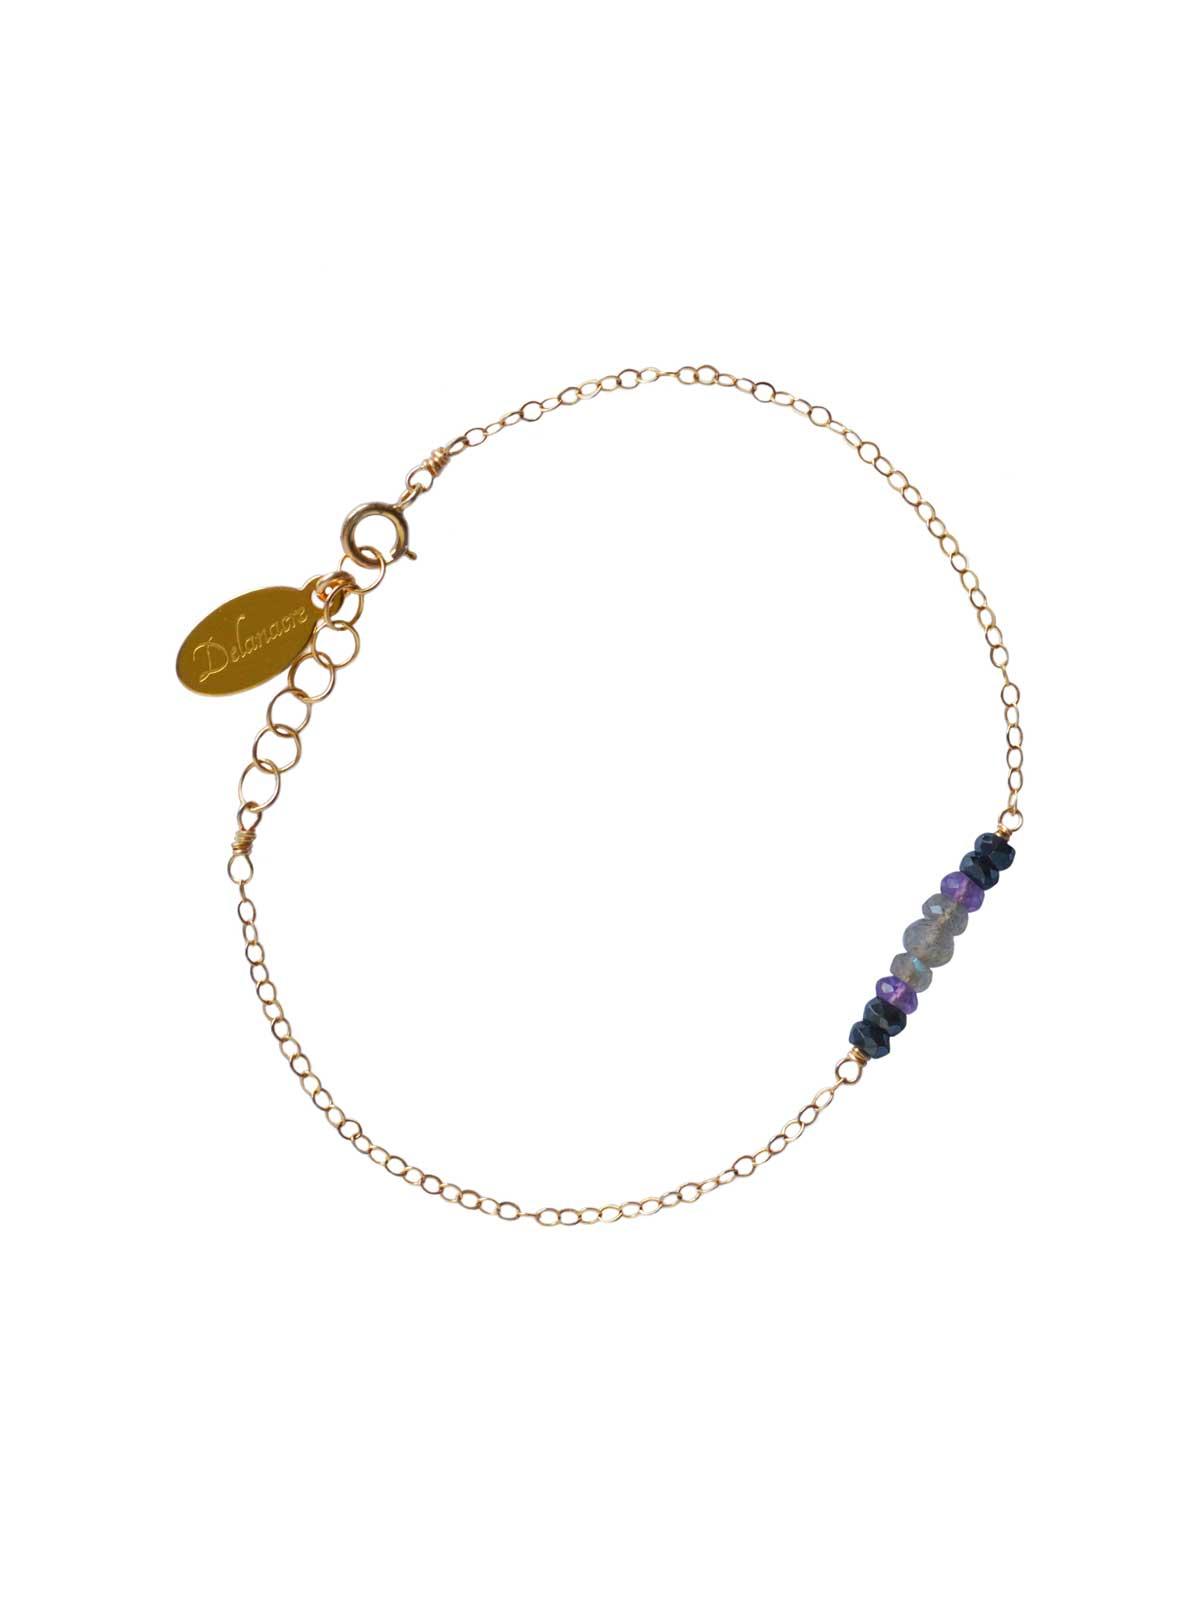 Bracelet in Gold-filled 14 Karat chain Labradorite Black Spinel Amethyst